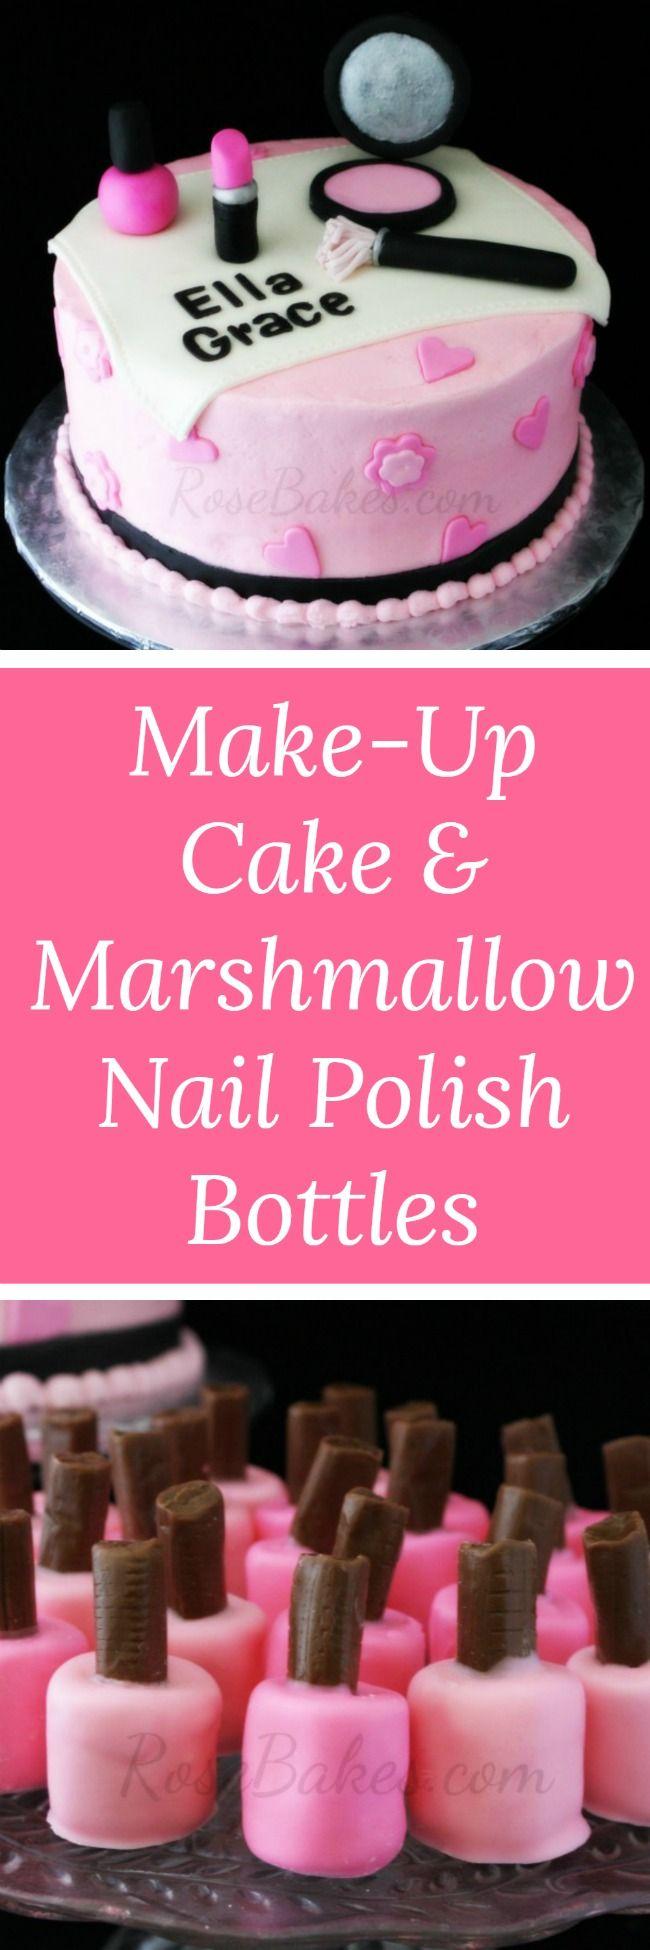 Make-Up Cake & Marshmallow Nail Polish Bottles by RoseBakes